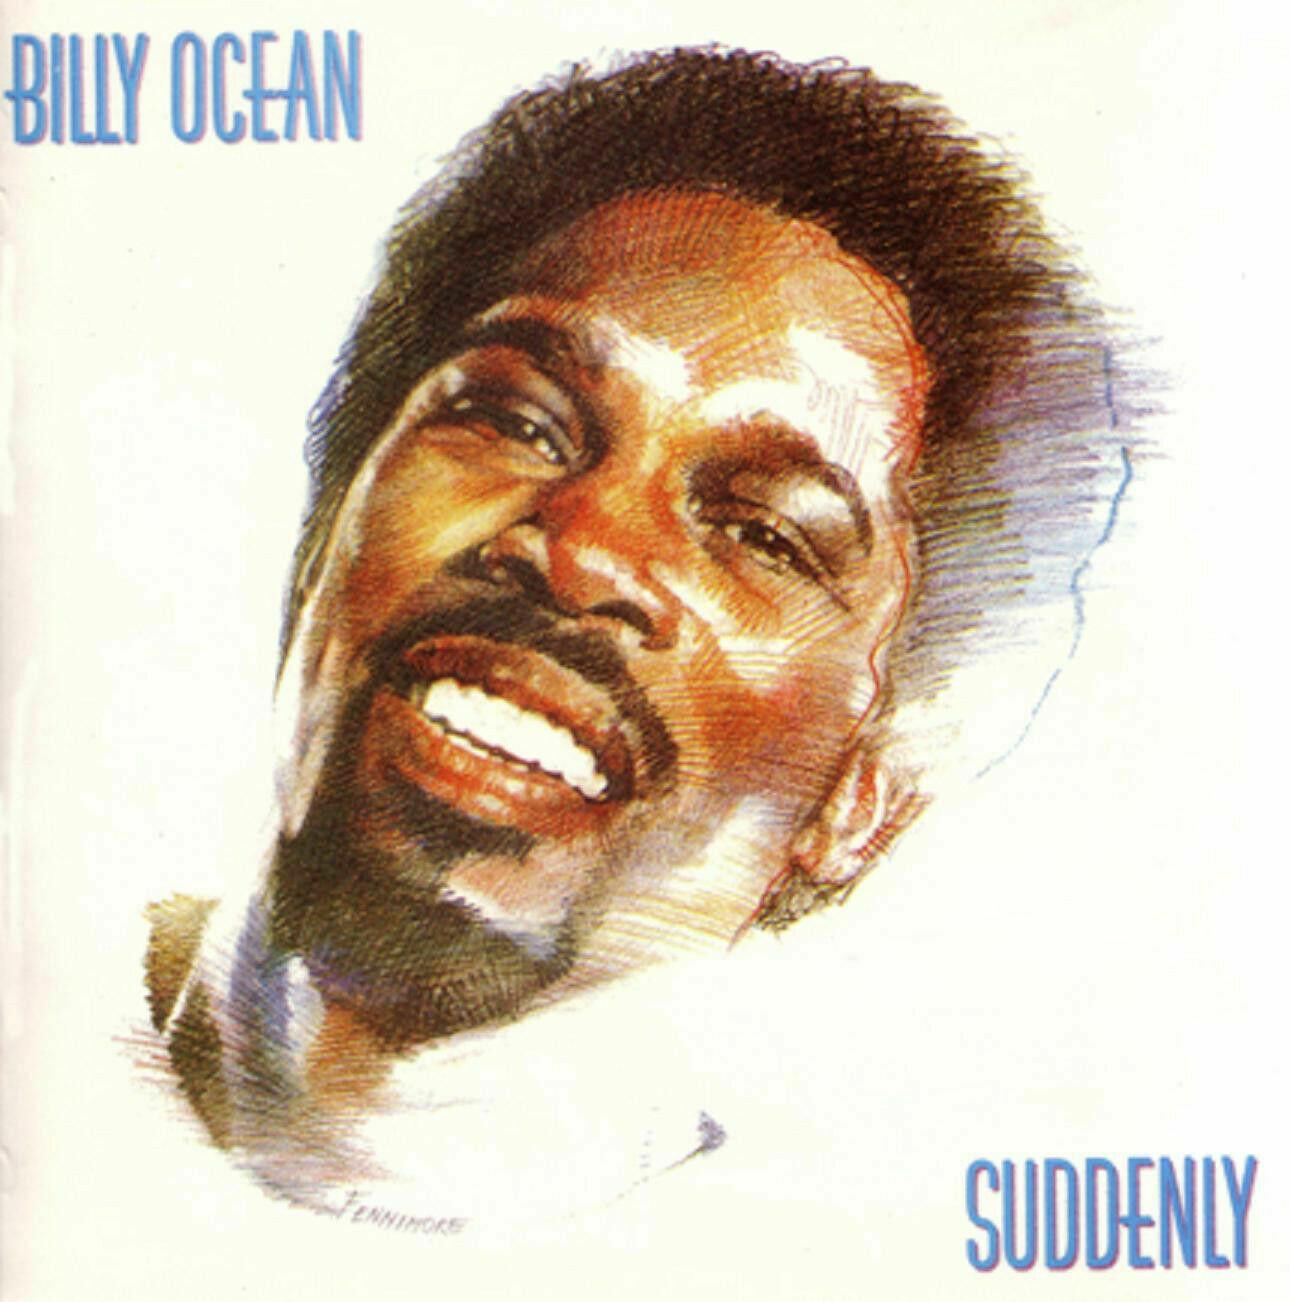 BILLY OCEAN - SUDDENLY - LP